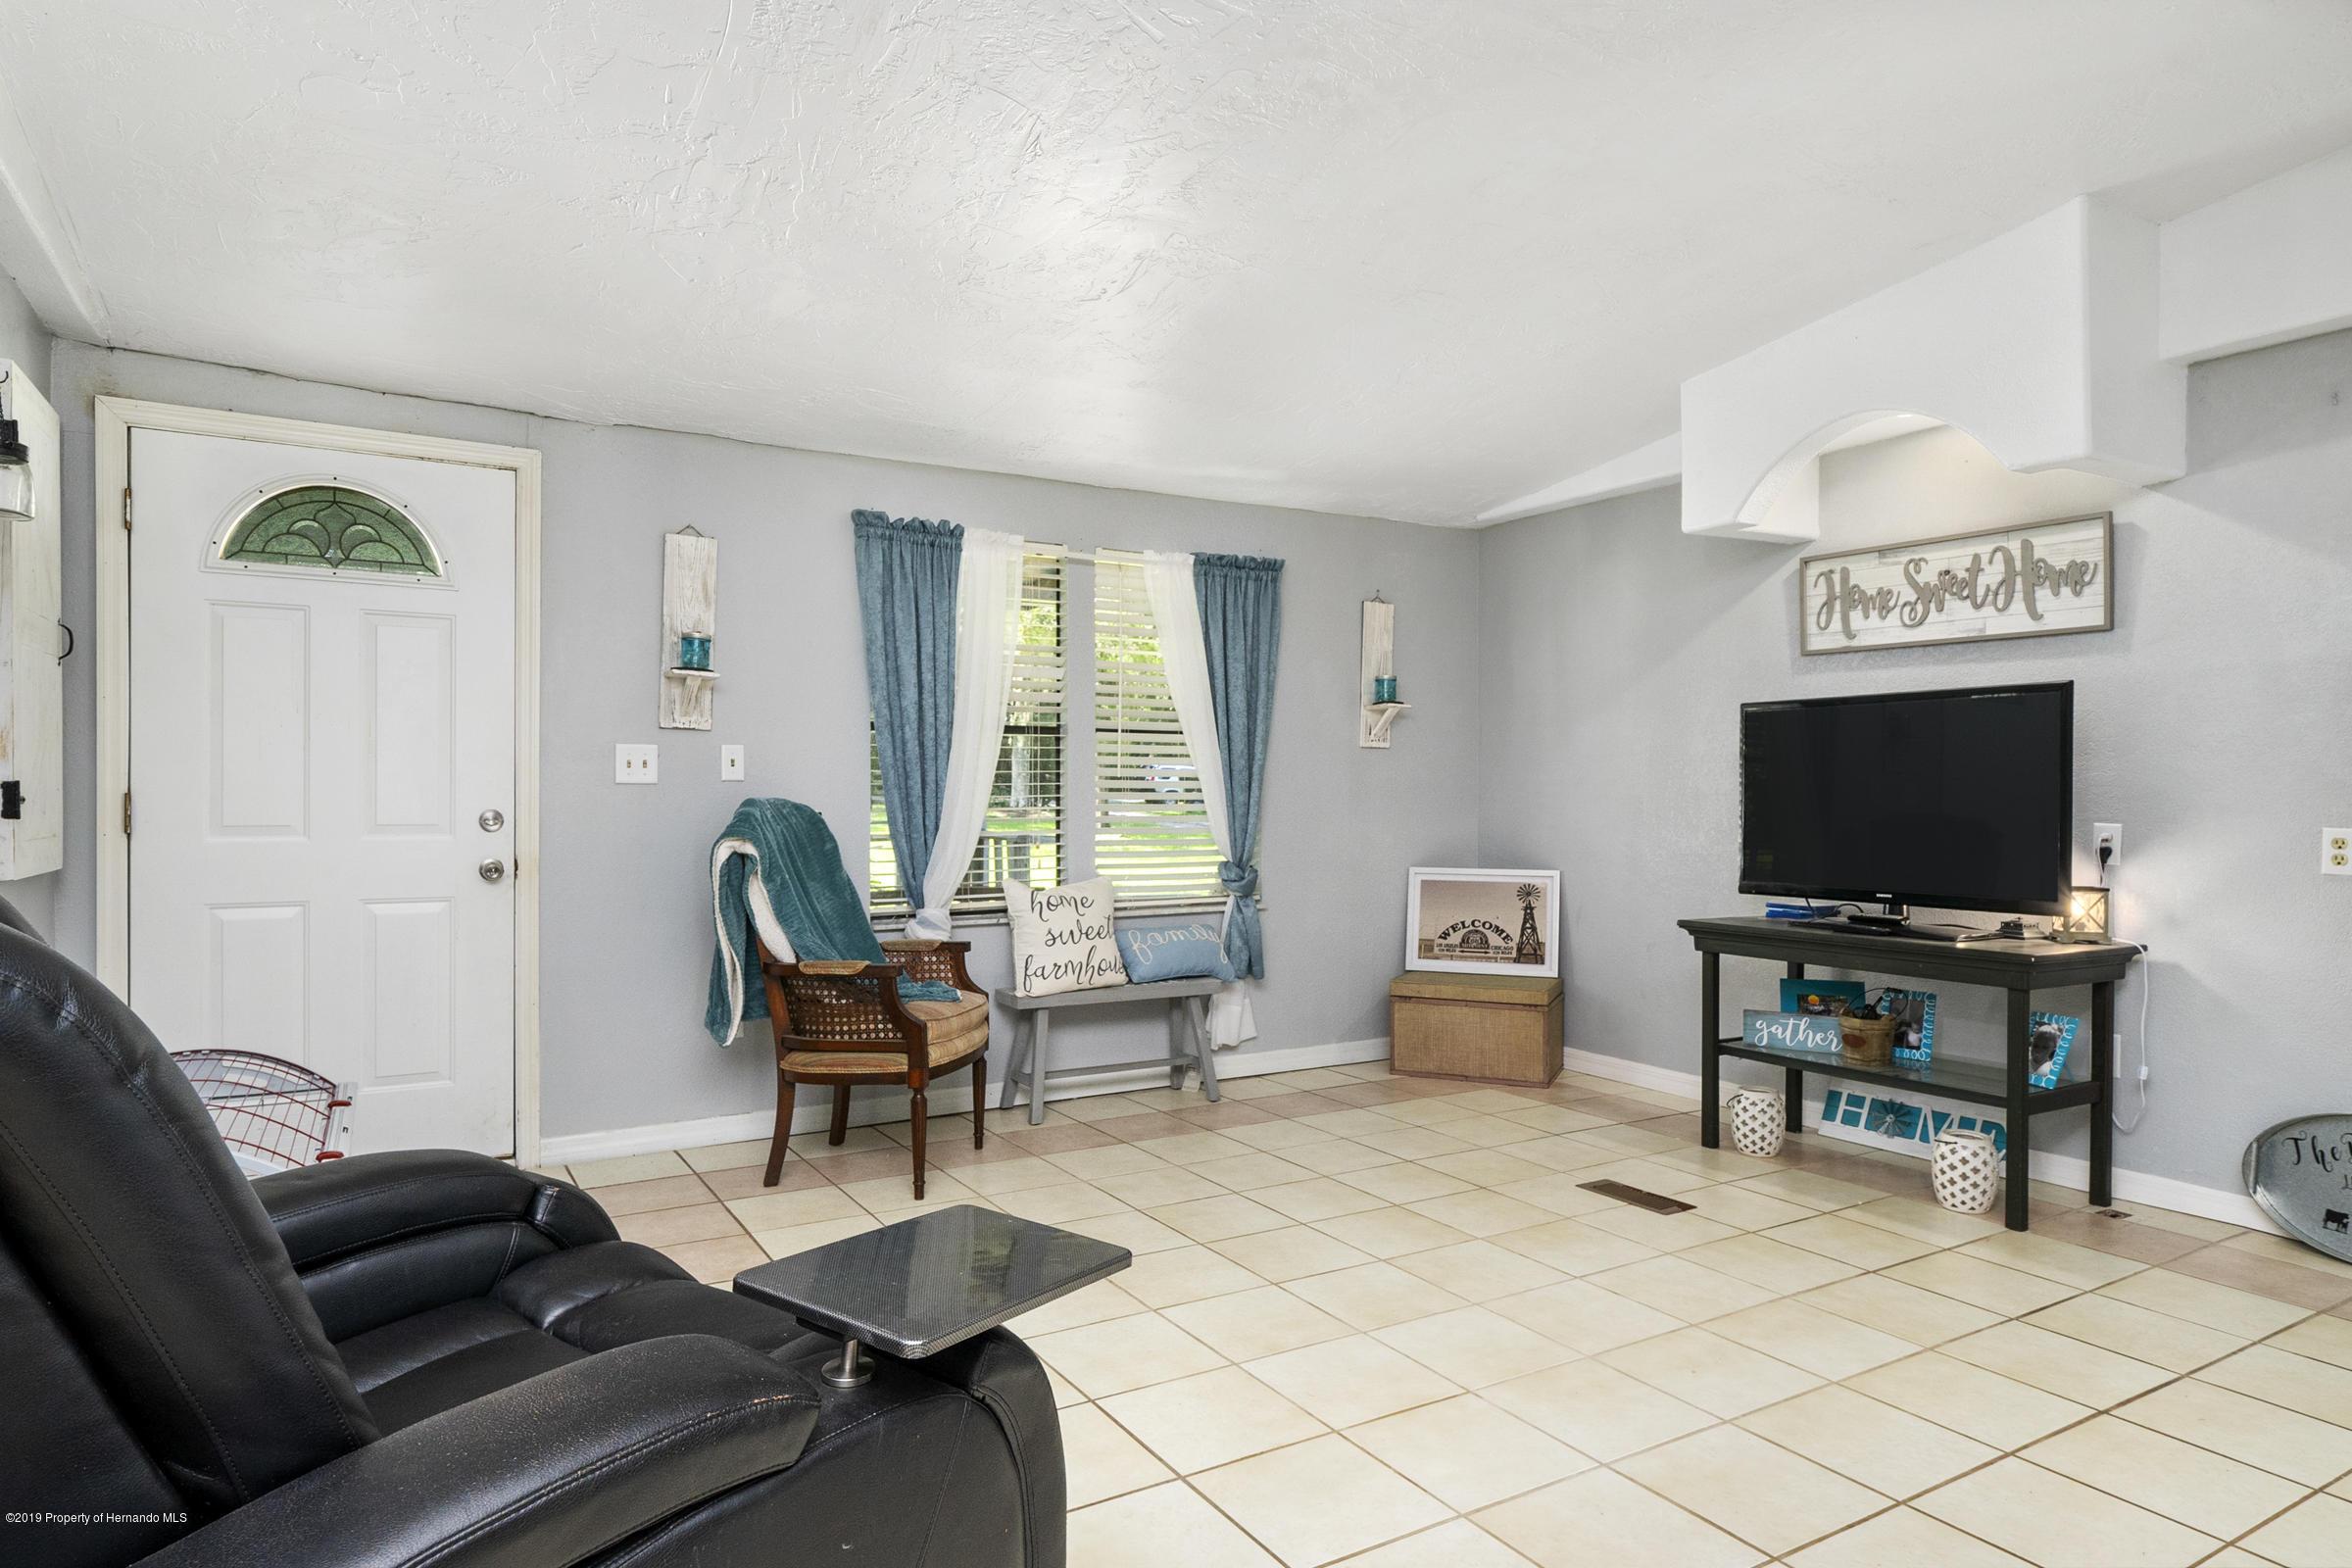 24435 Lanark Road, Brooksville, Florida 34601, 3 Bedrooms Bedrooms, ,2 BathroomsBathrooms,Residential,For Sale,Lanark,2203793